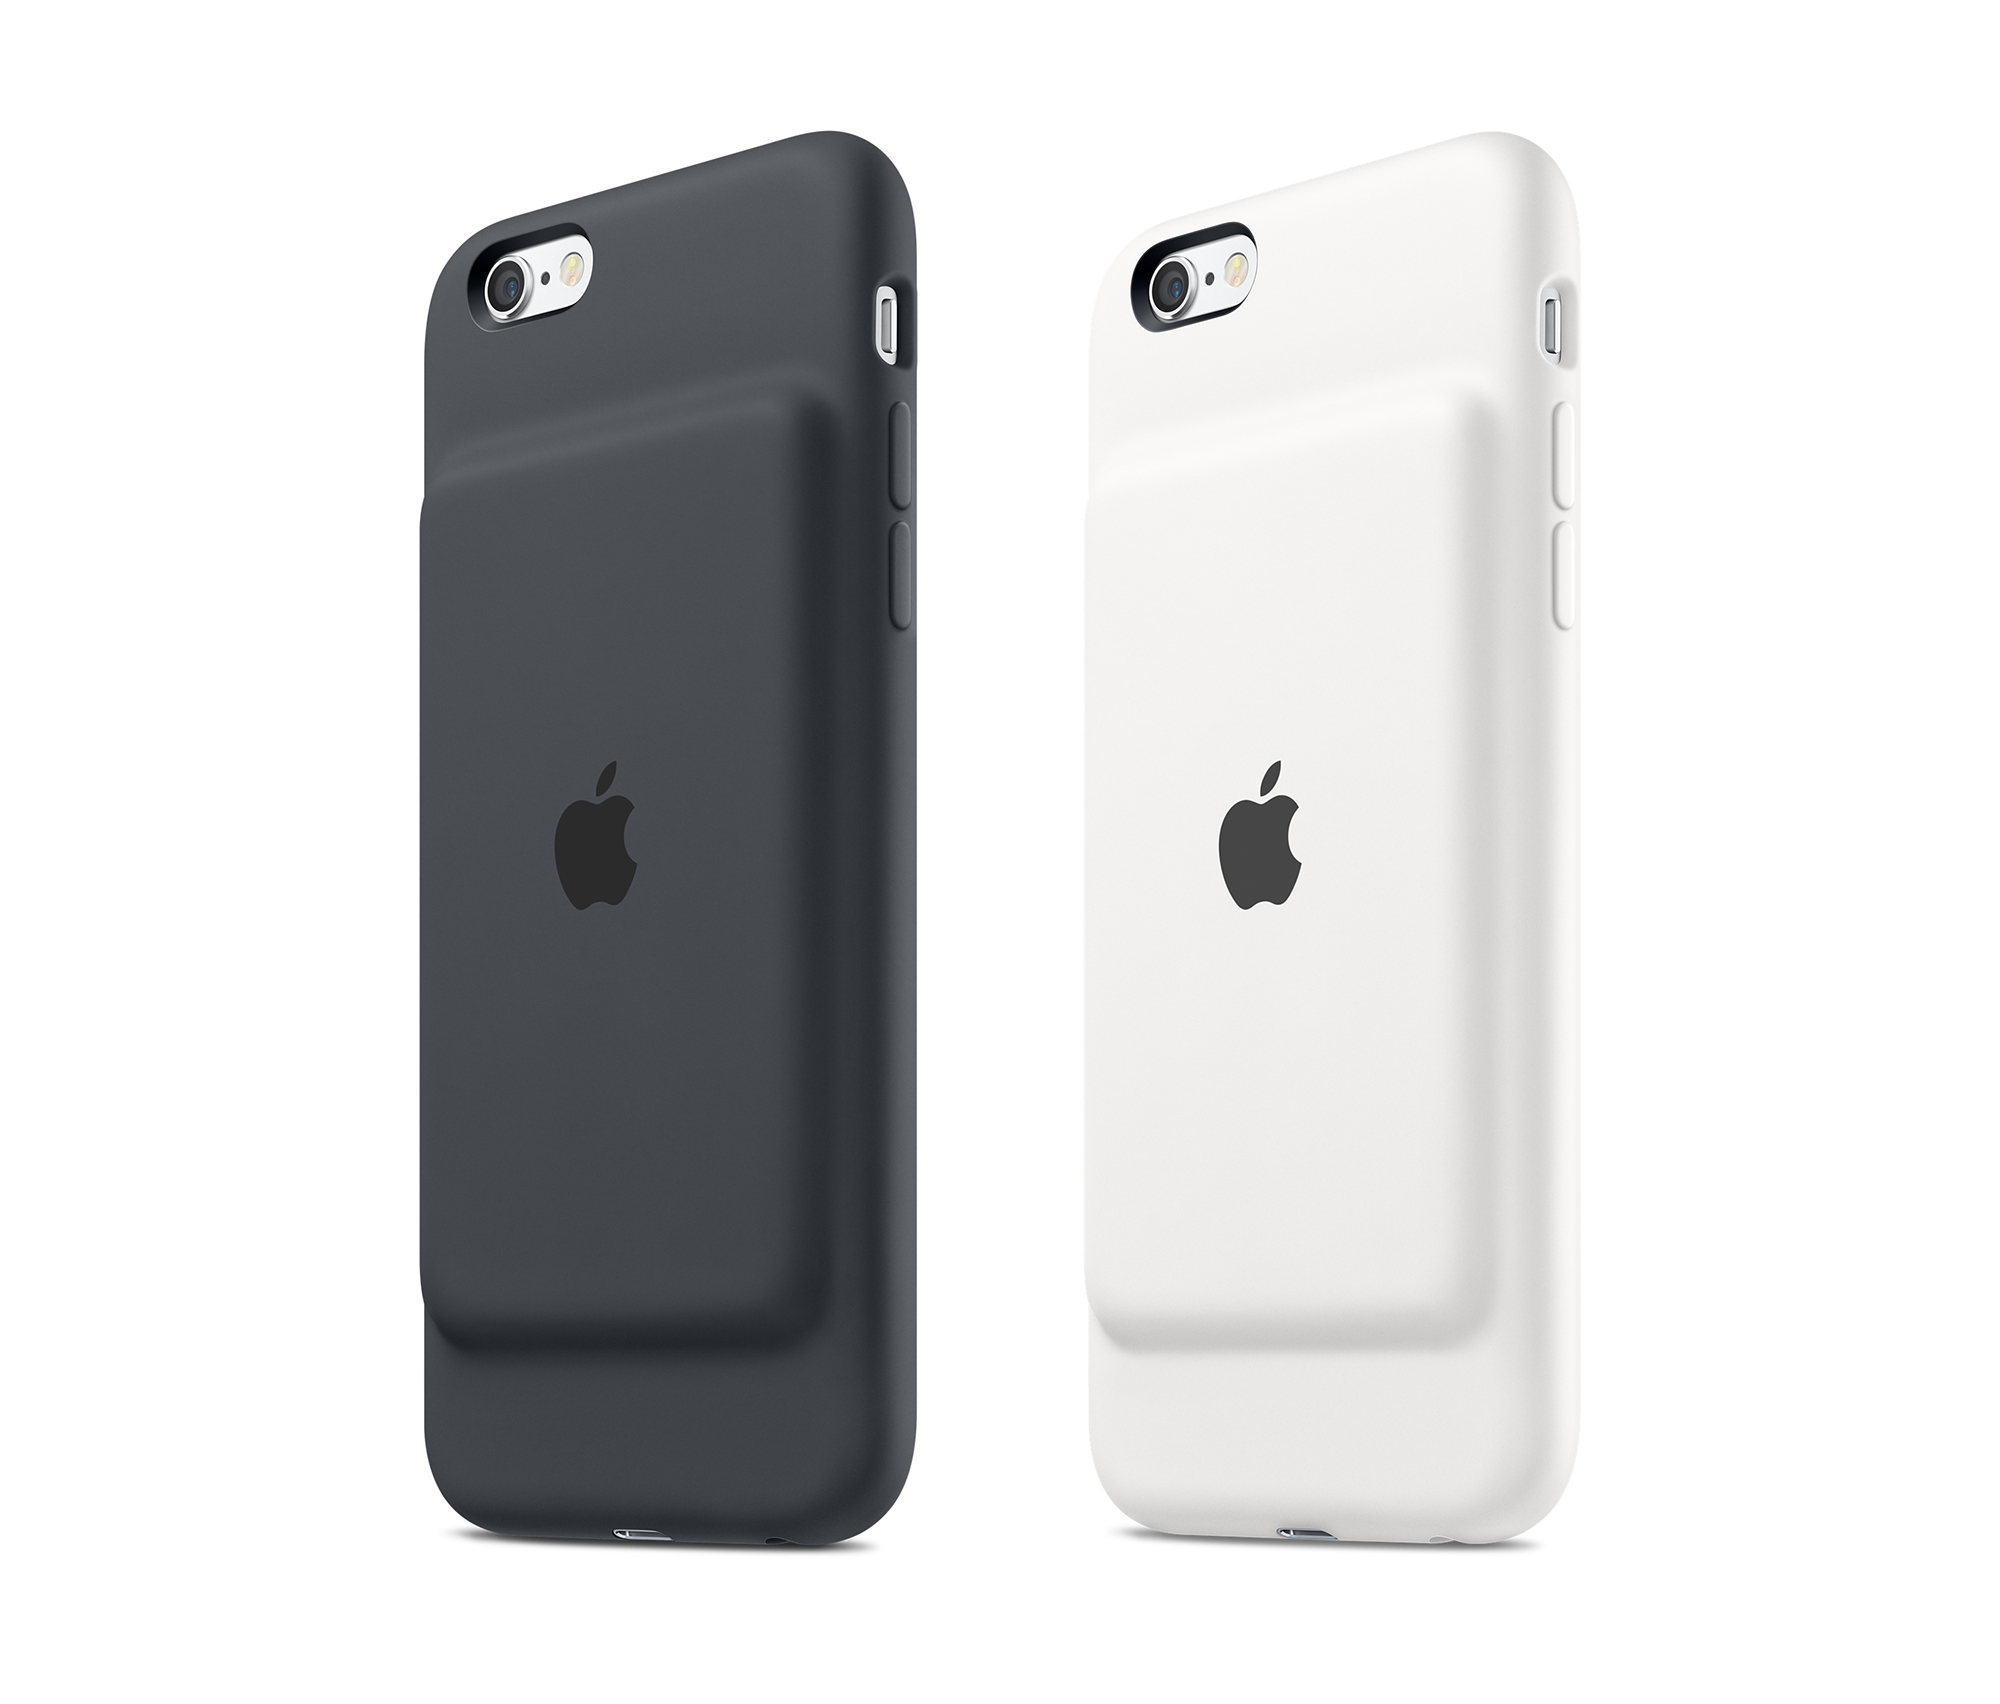 apple-smart-battery-case-for-iphone-6s-MGQM2.jpg